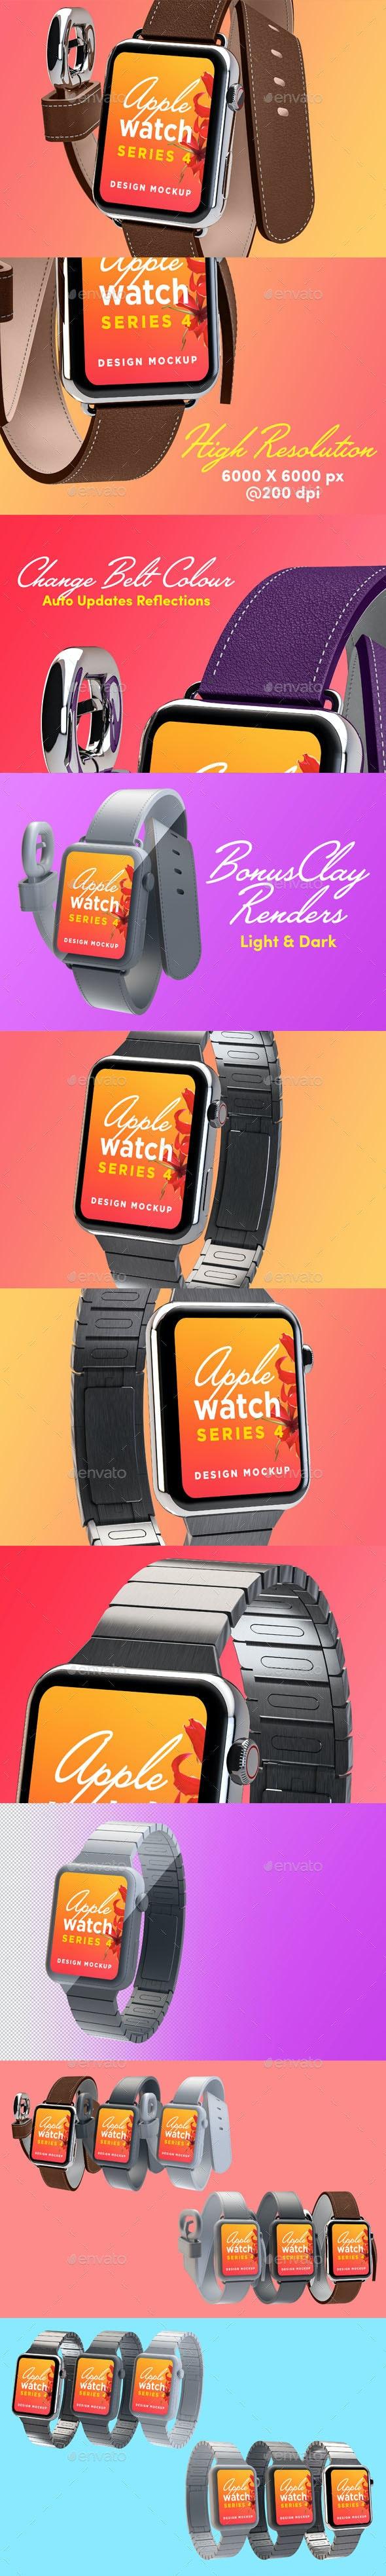 Apple Watch Design Mockup - Displays Product Mock-Ups